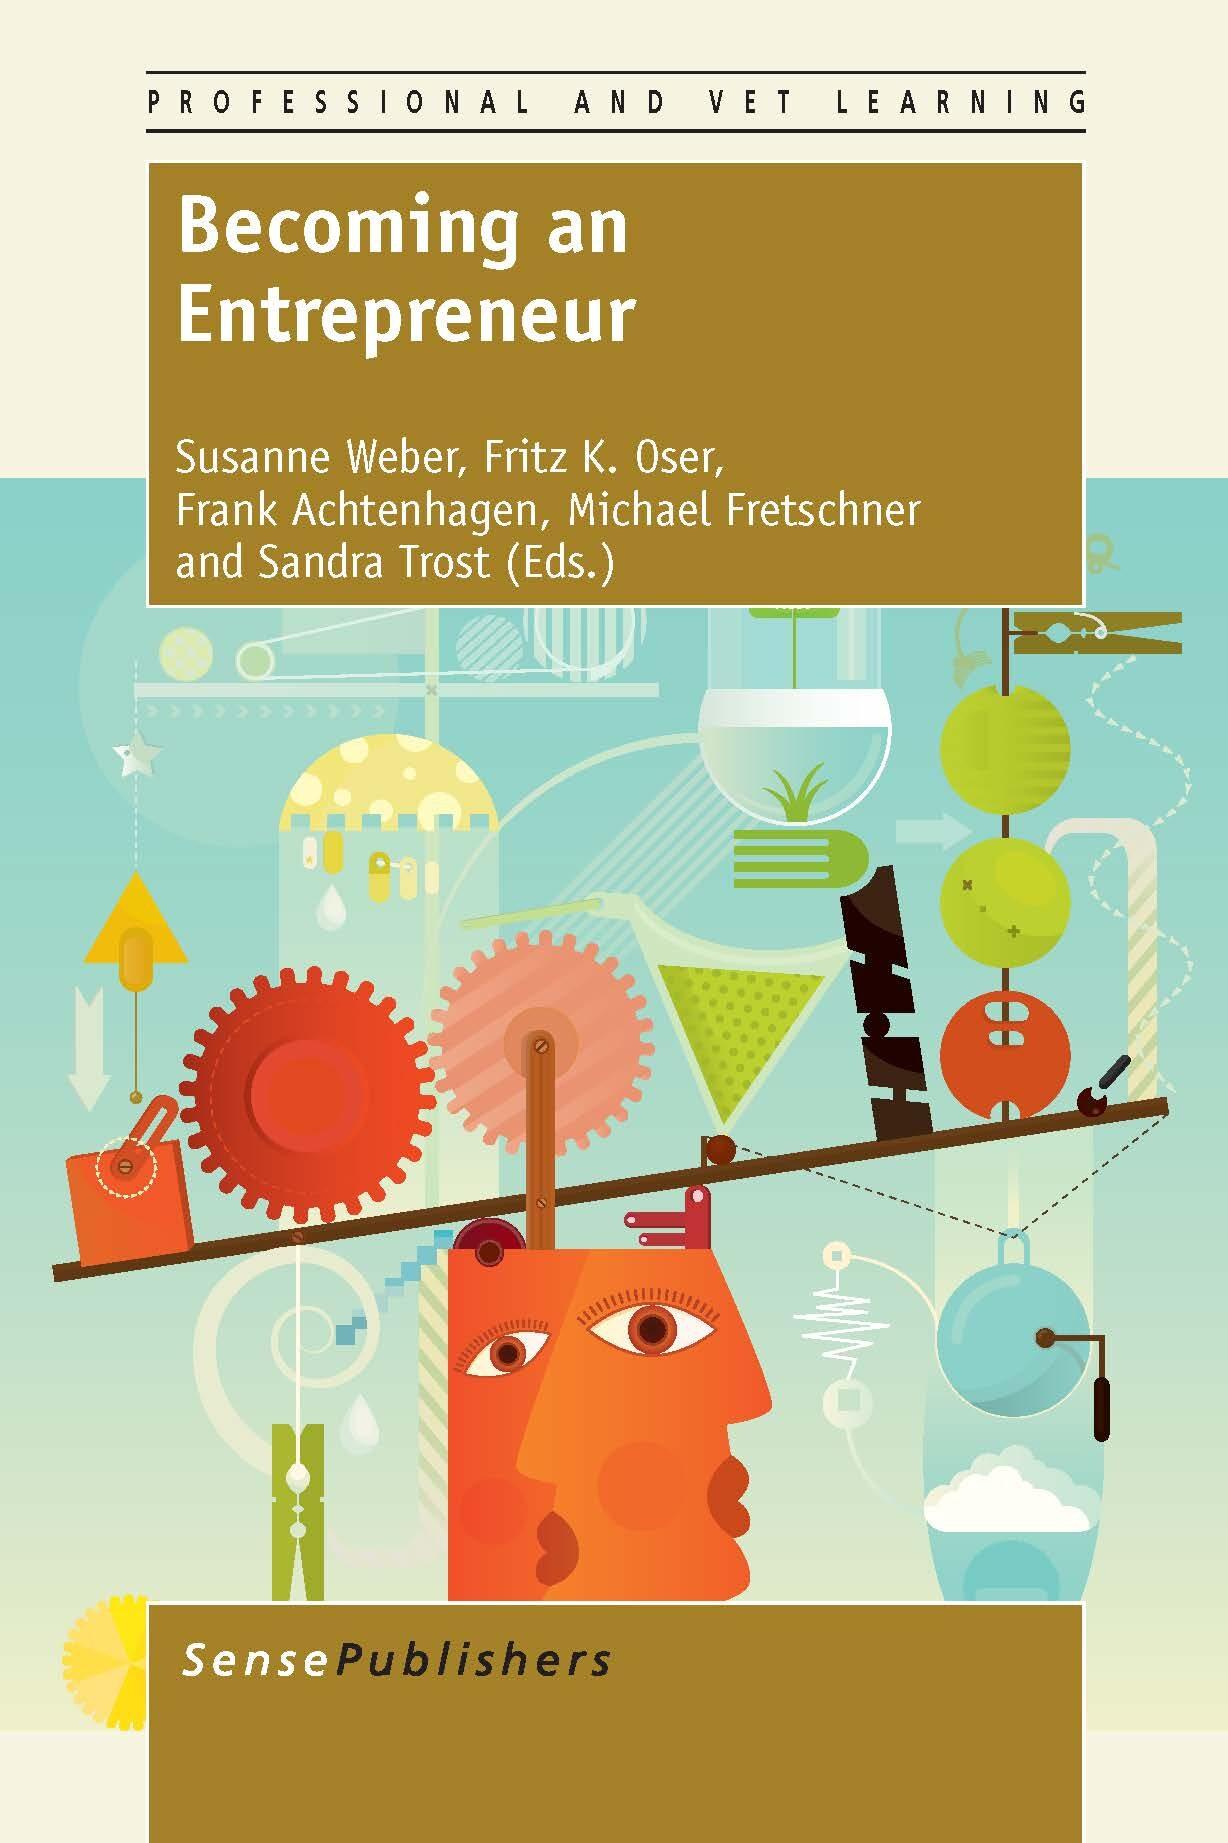 Osez L Art De La Table a research-and evidence-based entrepreneurship education